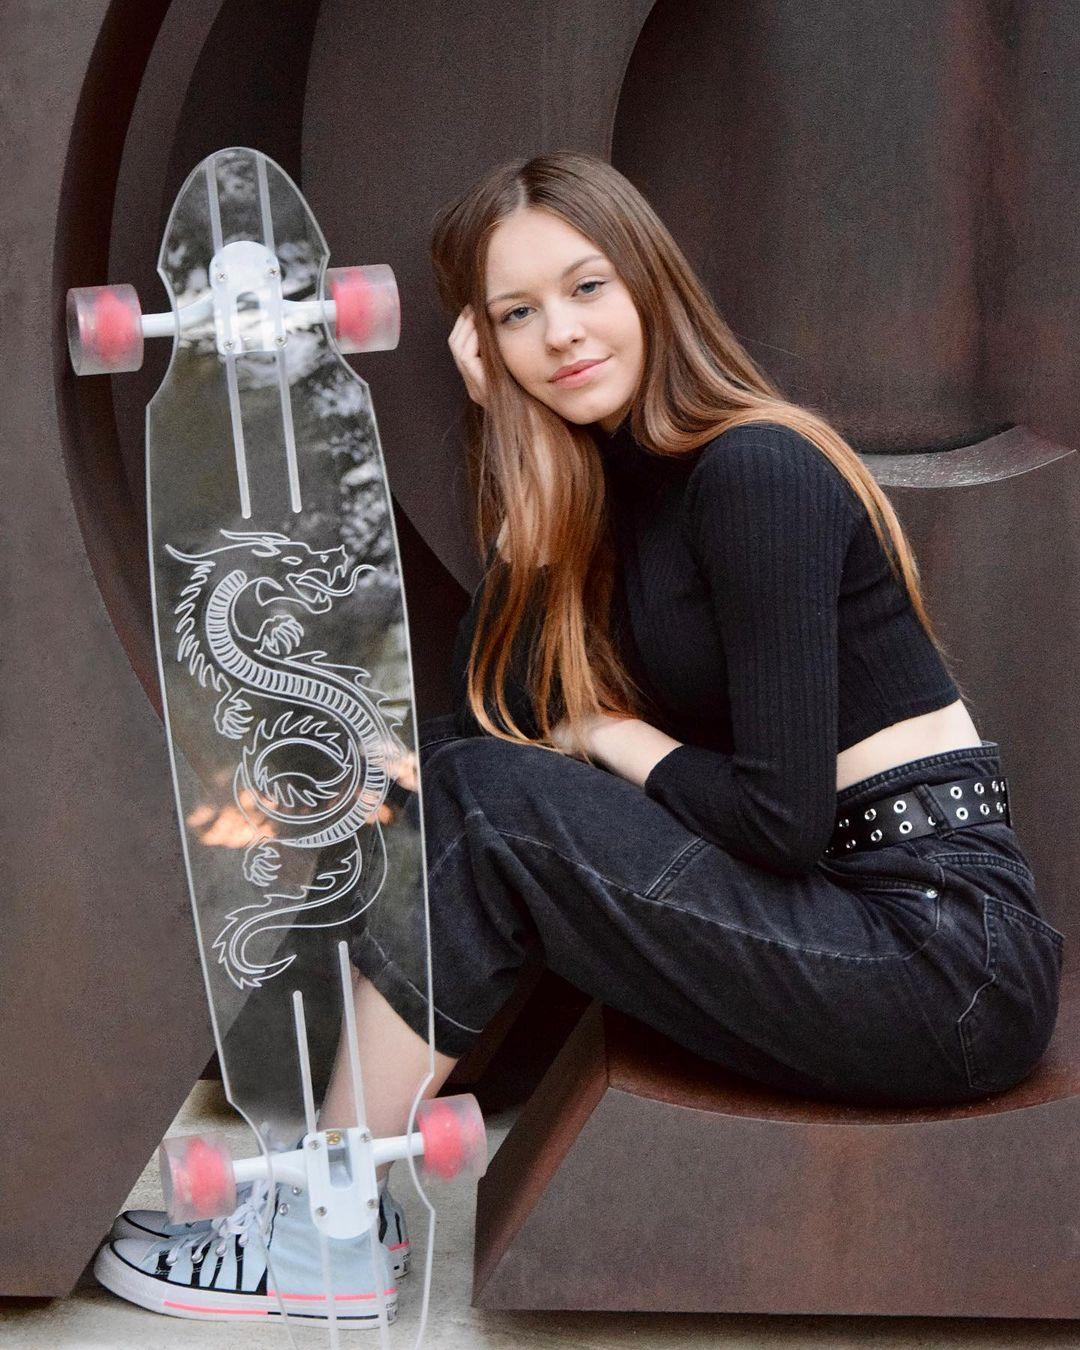 Klaudia-Nicole-Pietras-Wallpapers-Insta-Fit-Bio-21